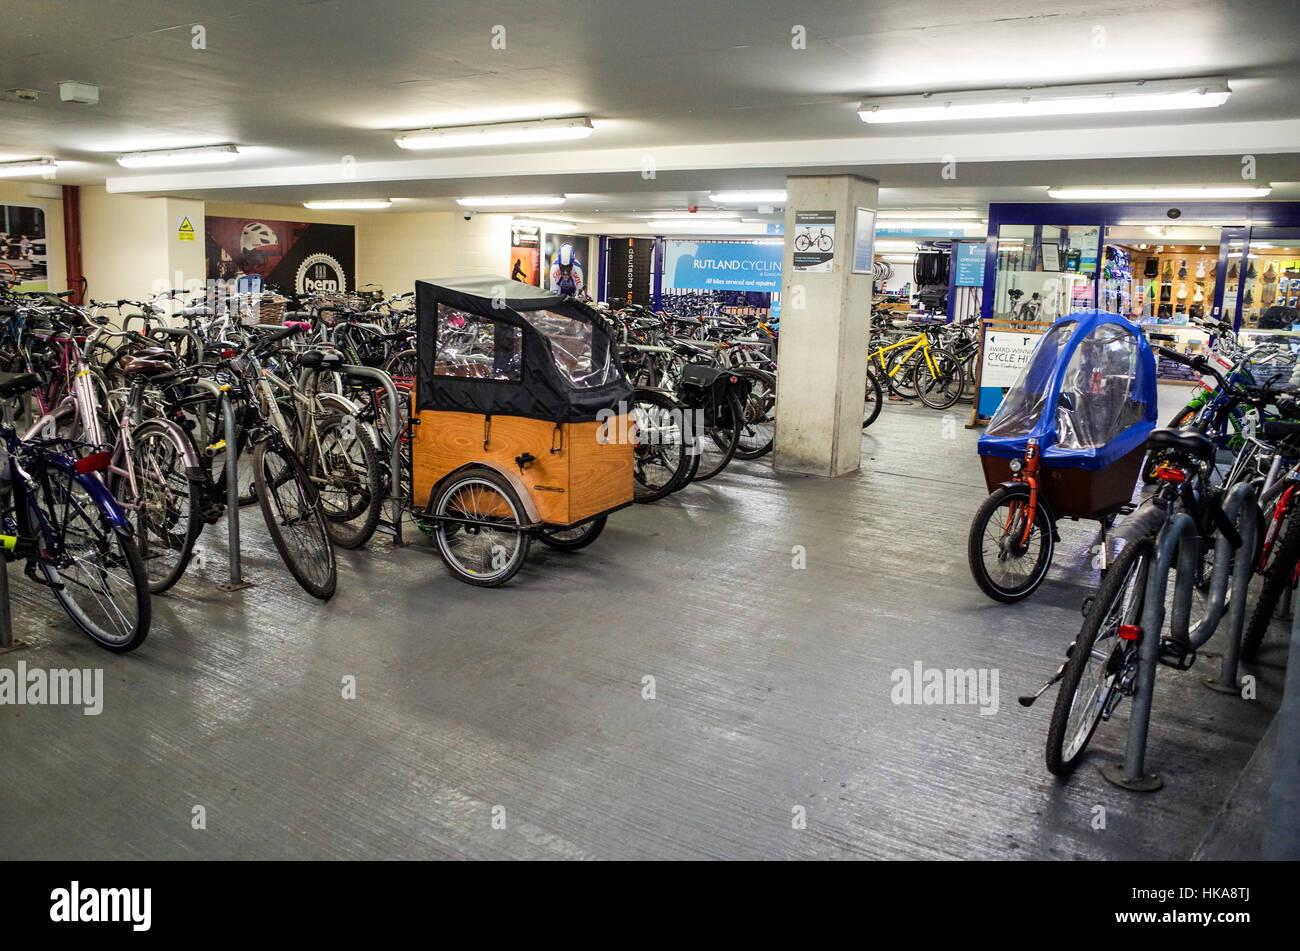 Assorted bikes parked in the bike park under the Grand Arcade development, Cambridge UK - Stock Image